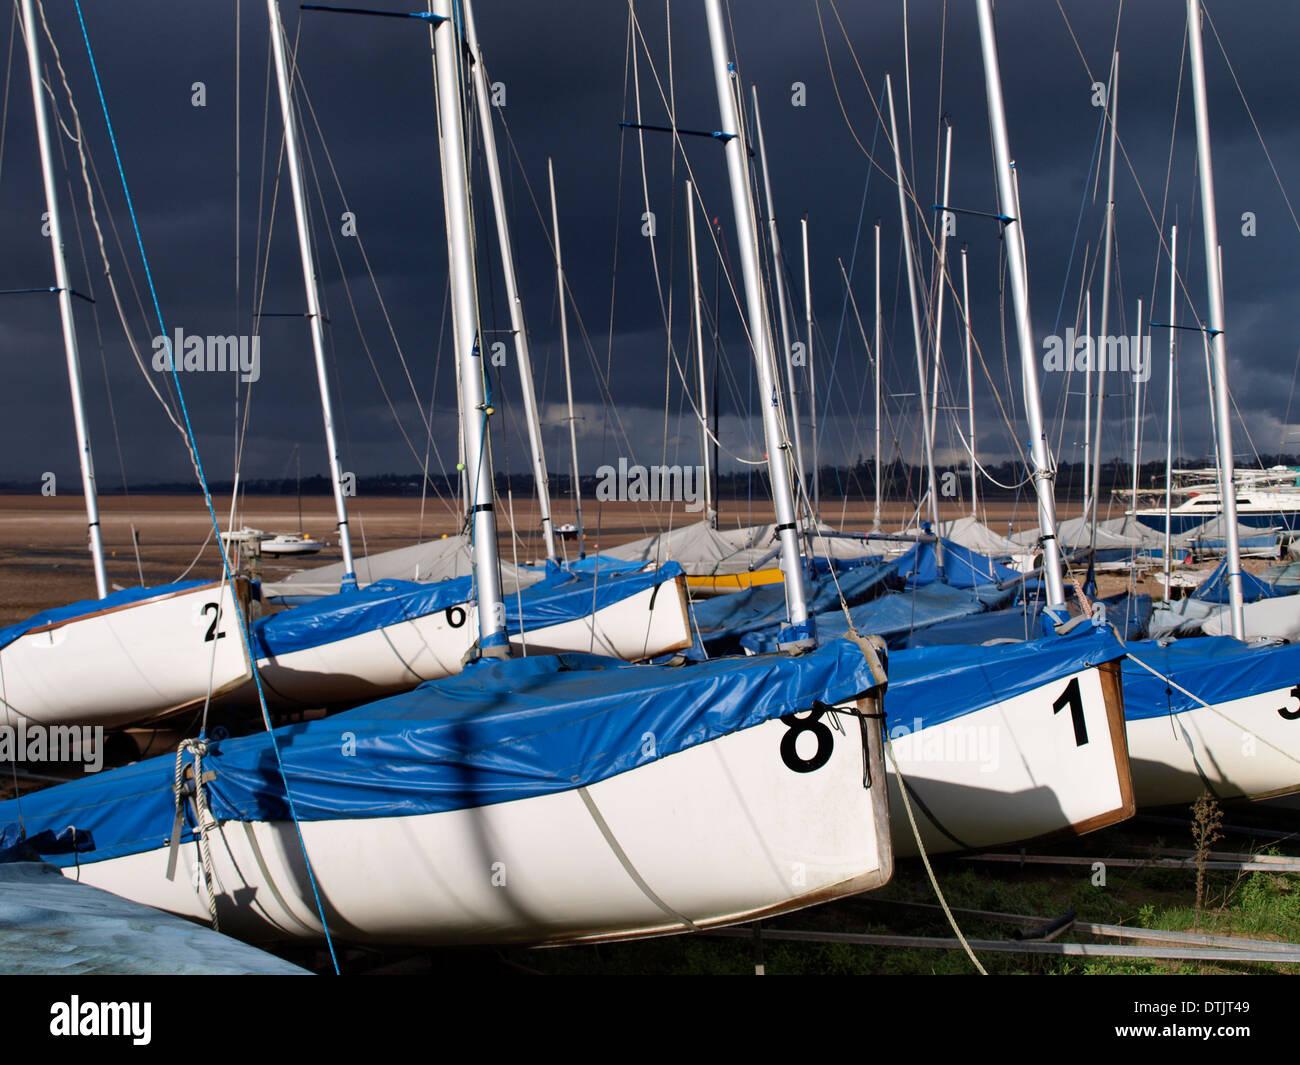 Yachts with black skies behind, Exmouth, Devon, UK - Stock Image